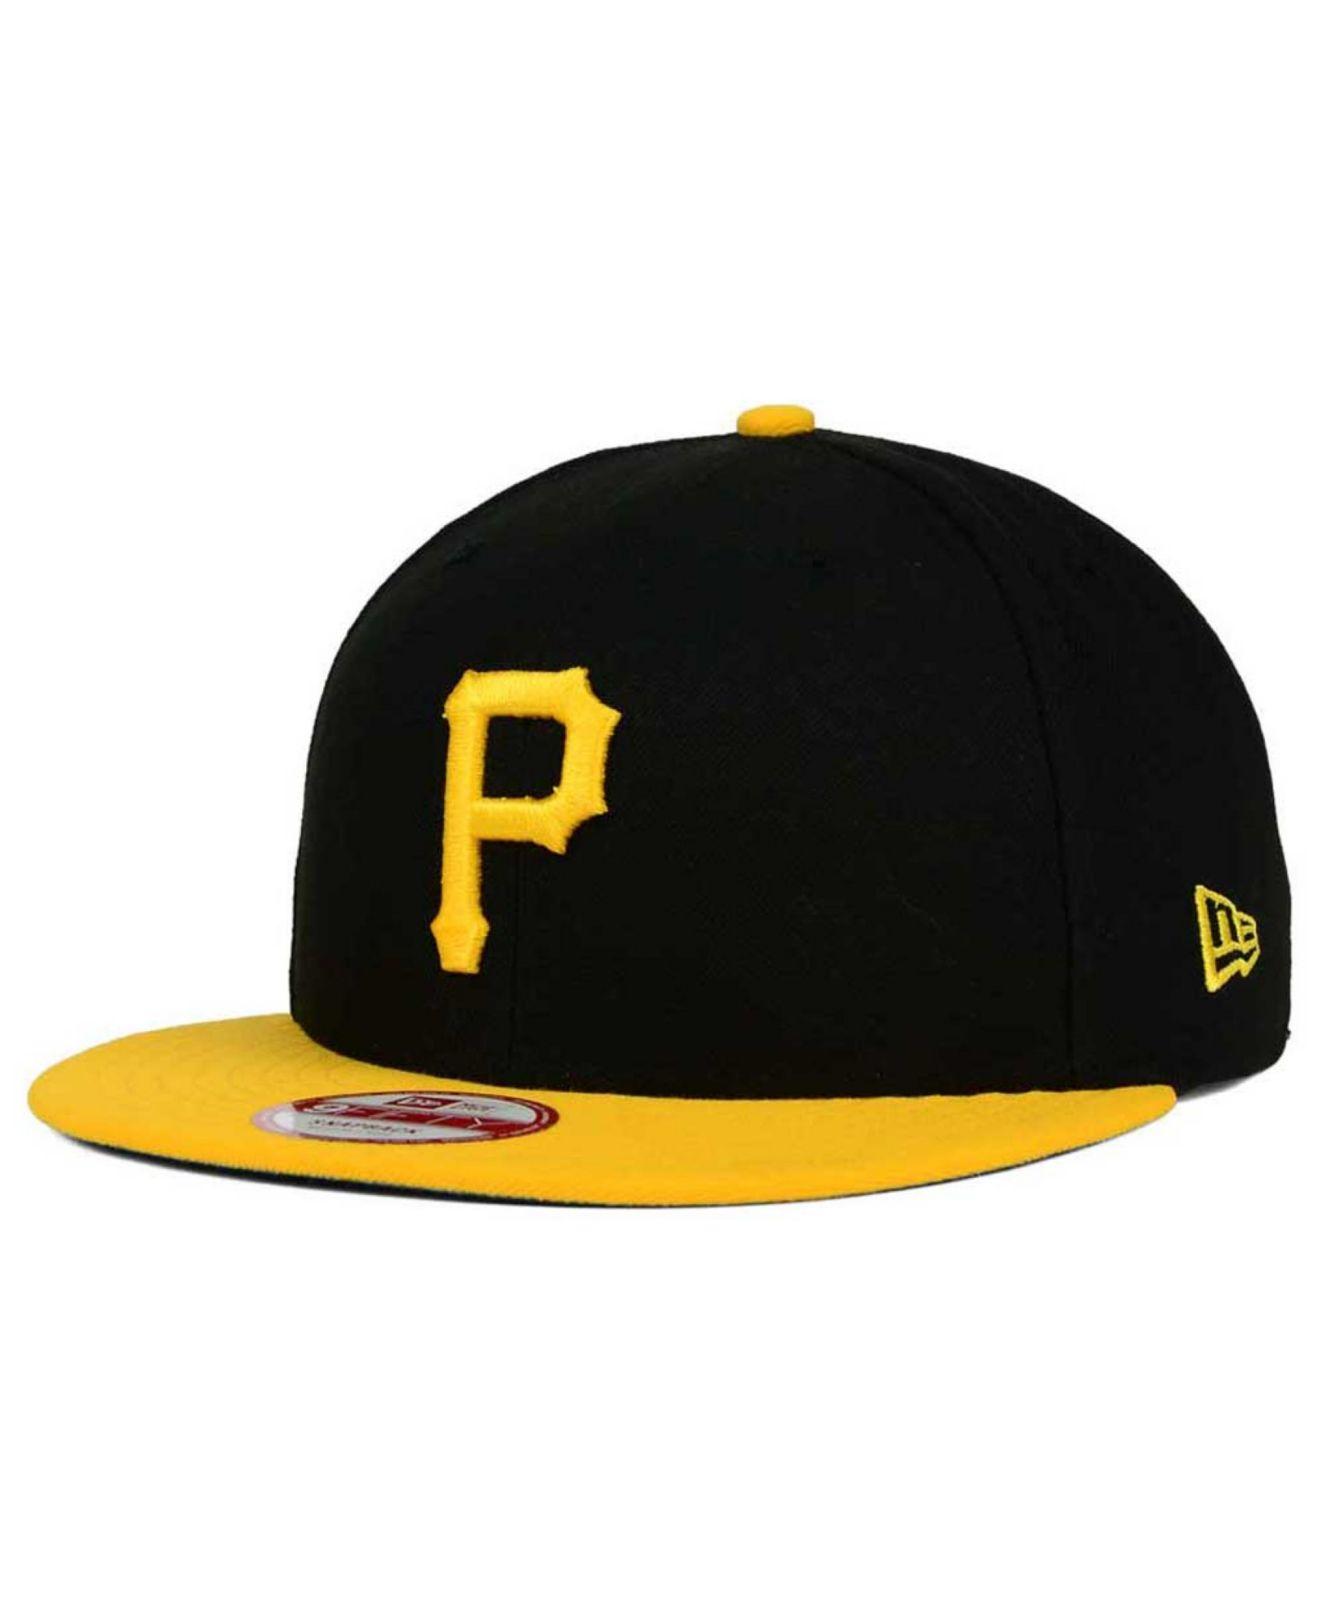 087bbc85336 ... switzerland lyst ktz pittsburgh pirates all star patch 9fifty snapback  cap in b0b4f 03214 ...